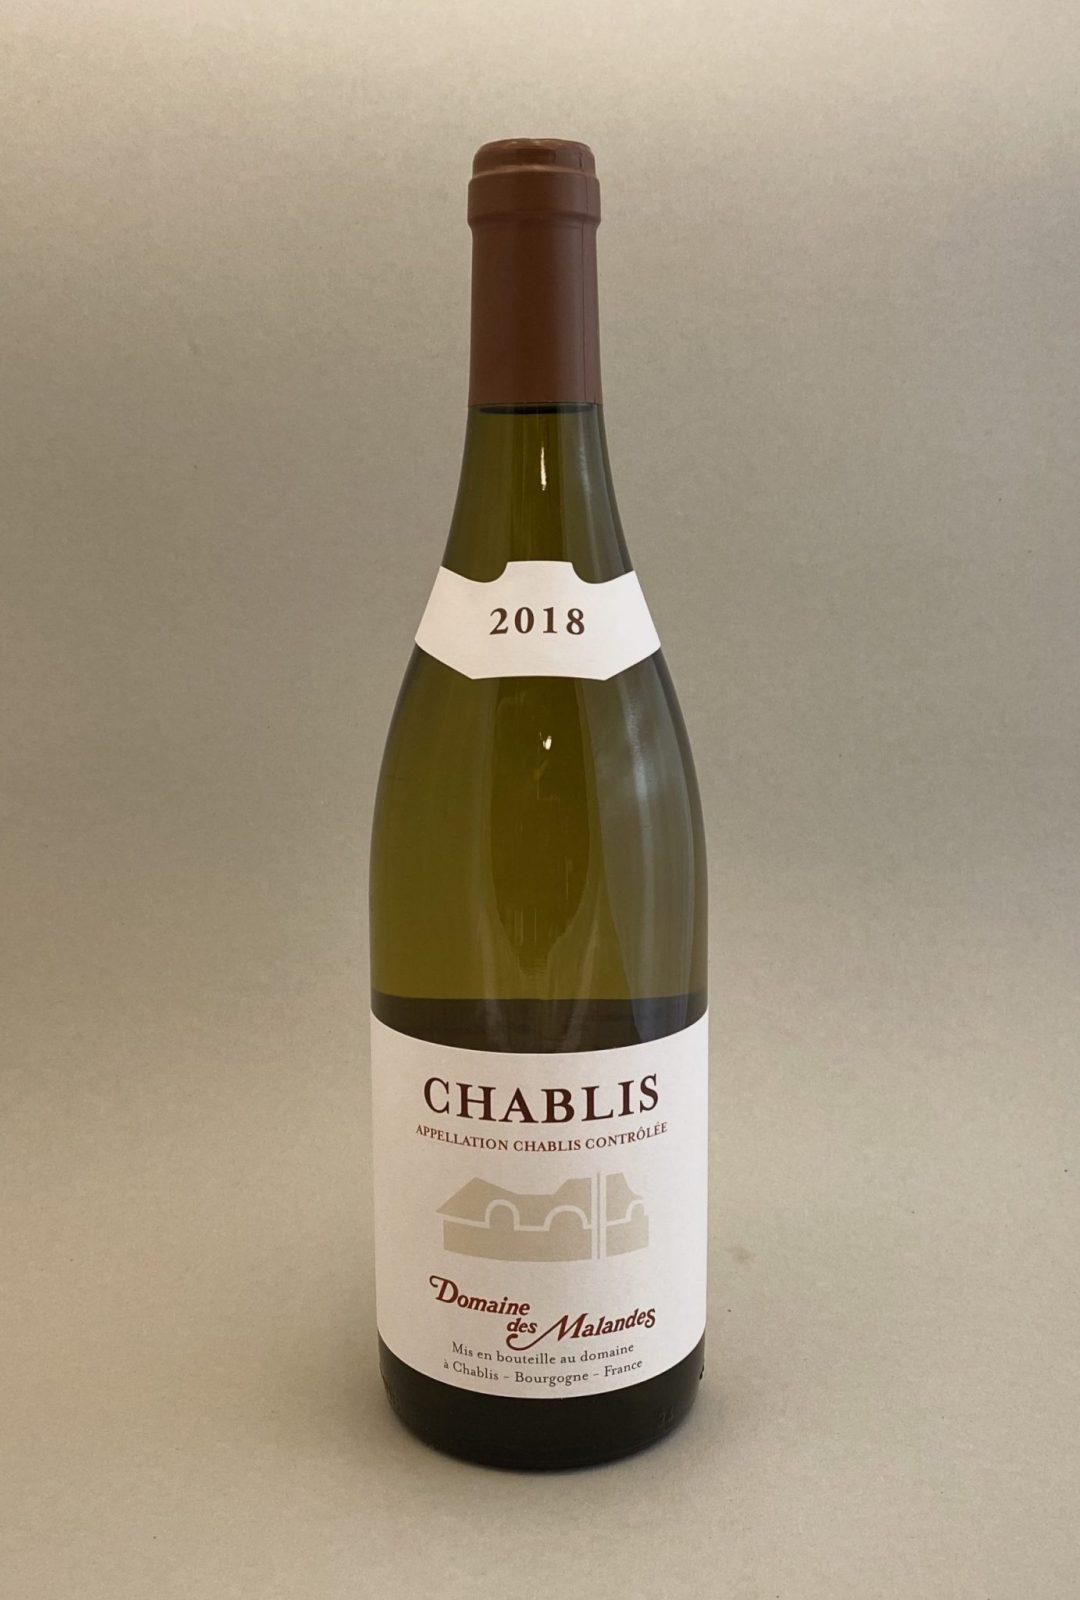 DOMAINE DES MALANDES Chablis 2018, vinoteka Bratislava slnecnice mesto, petrzalka, vino biele z Francúzska